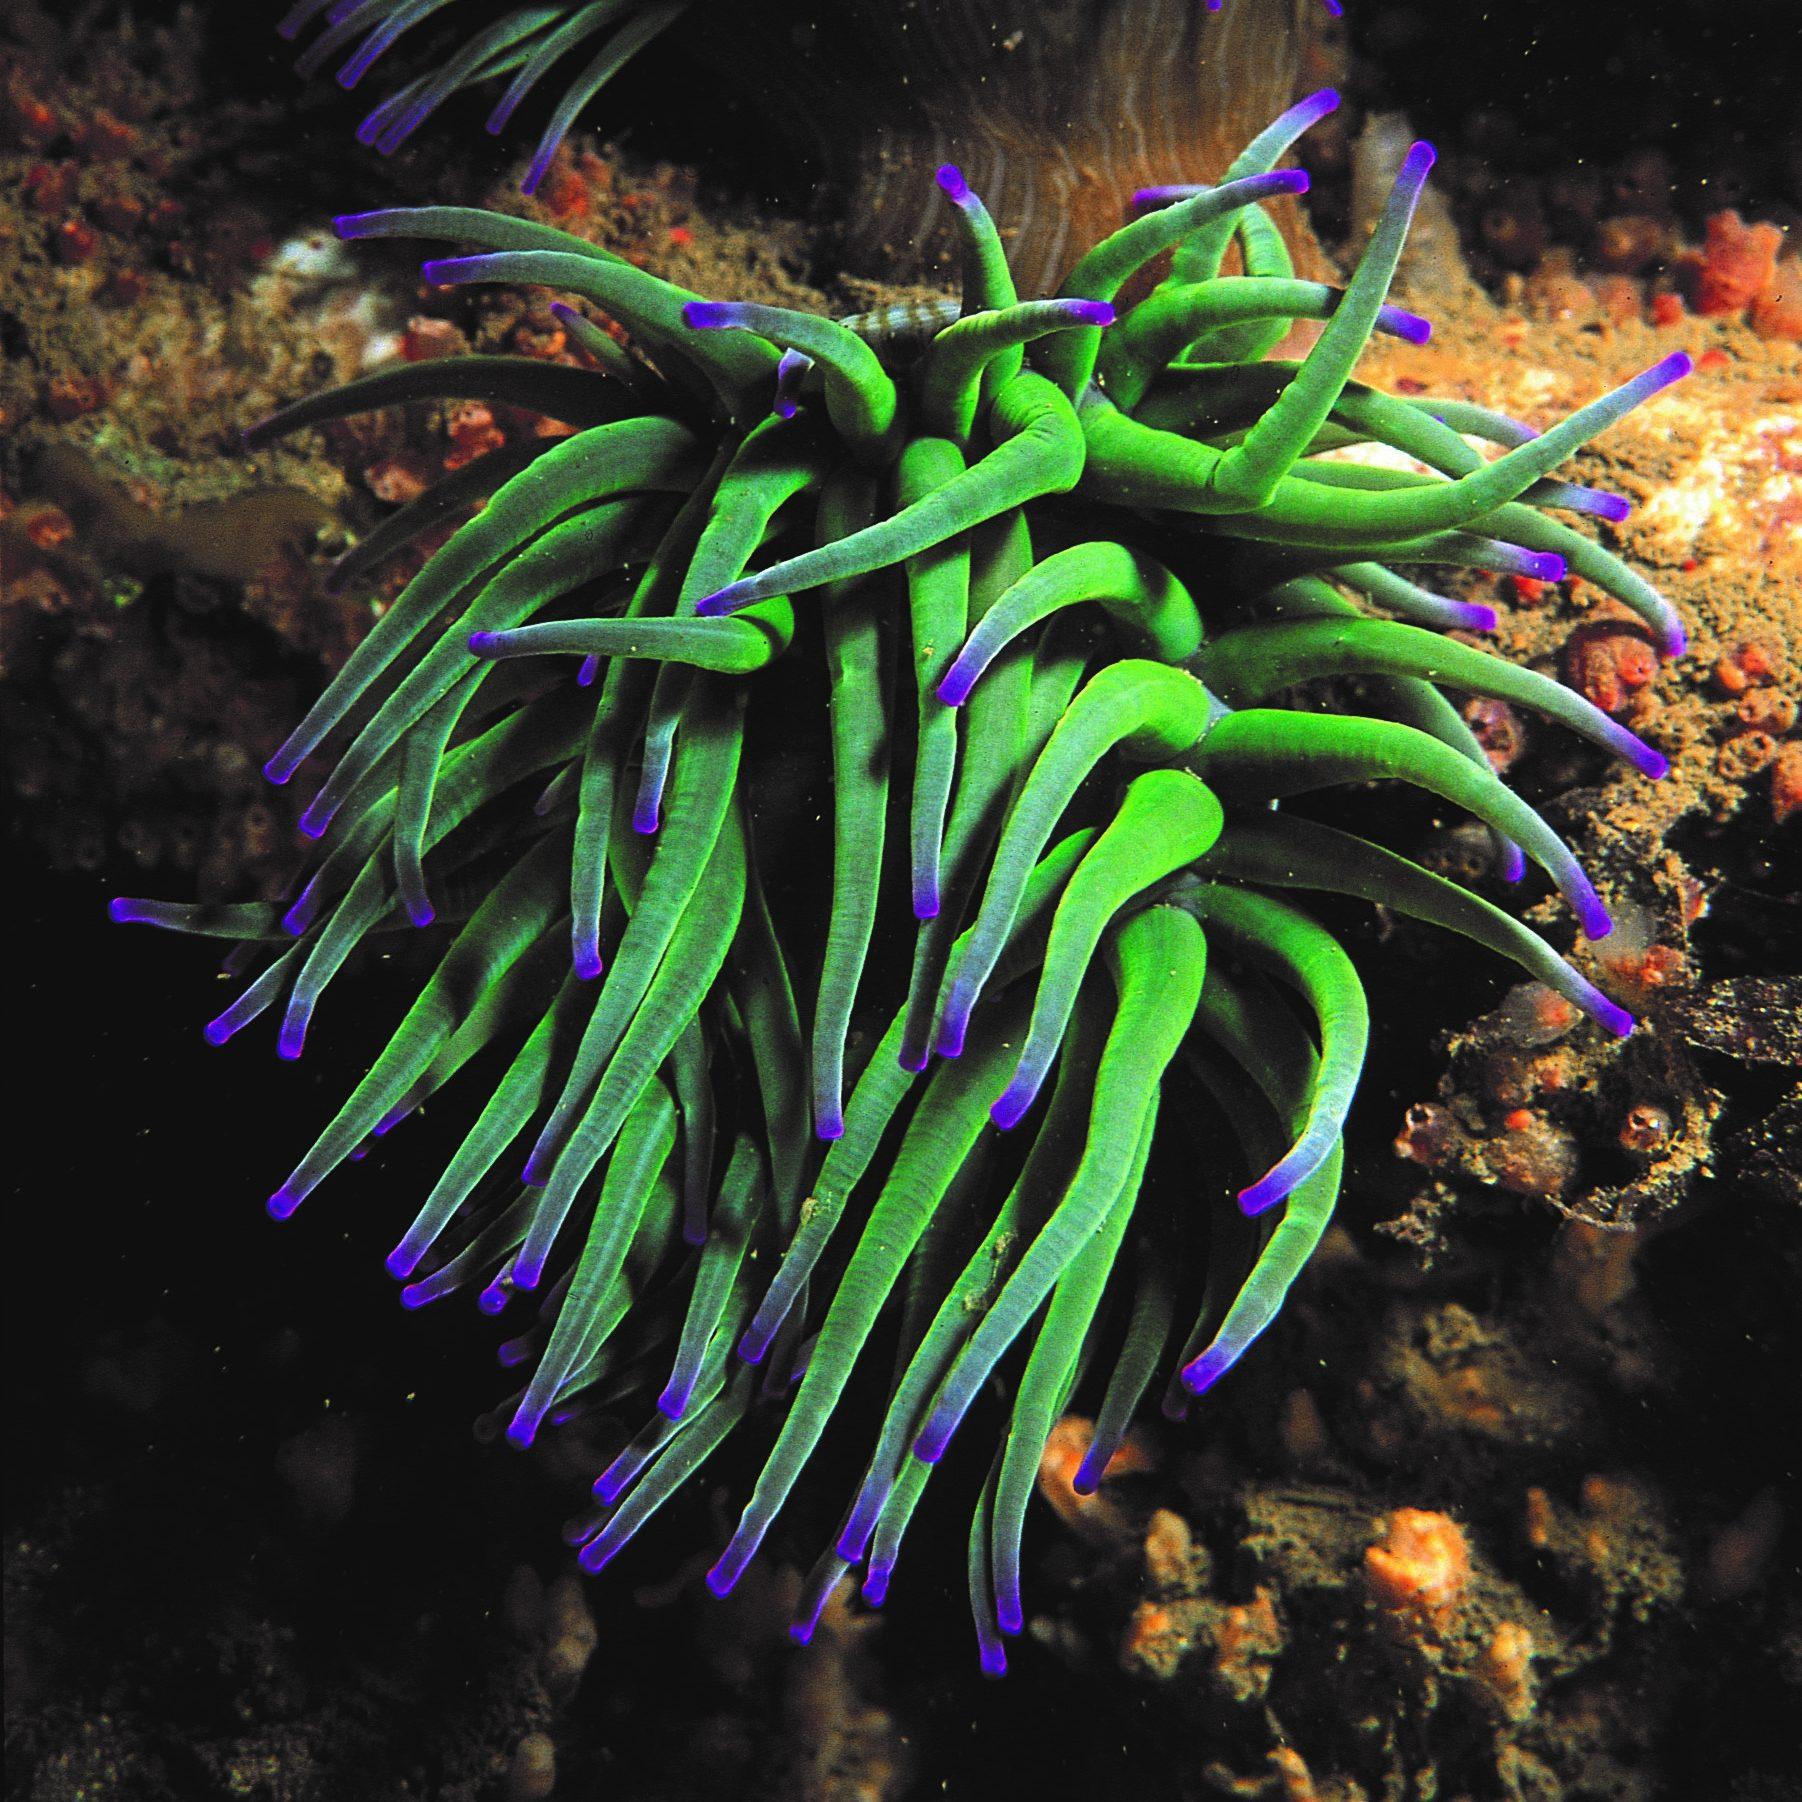 Snakelocks anemone c. Paul Naylor